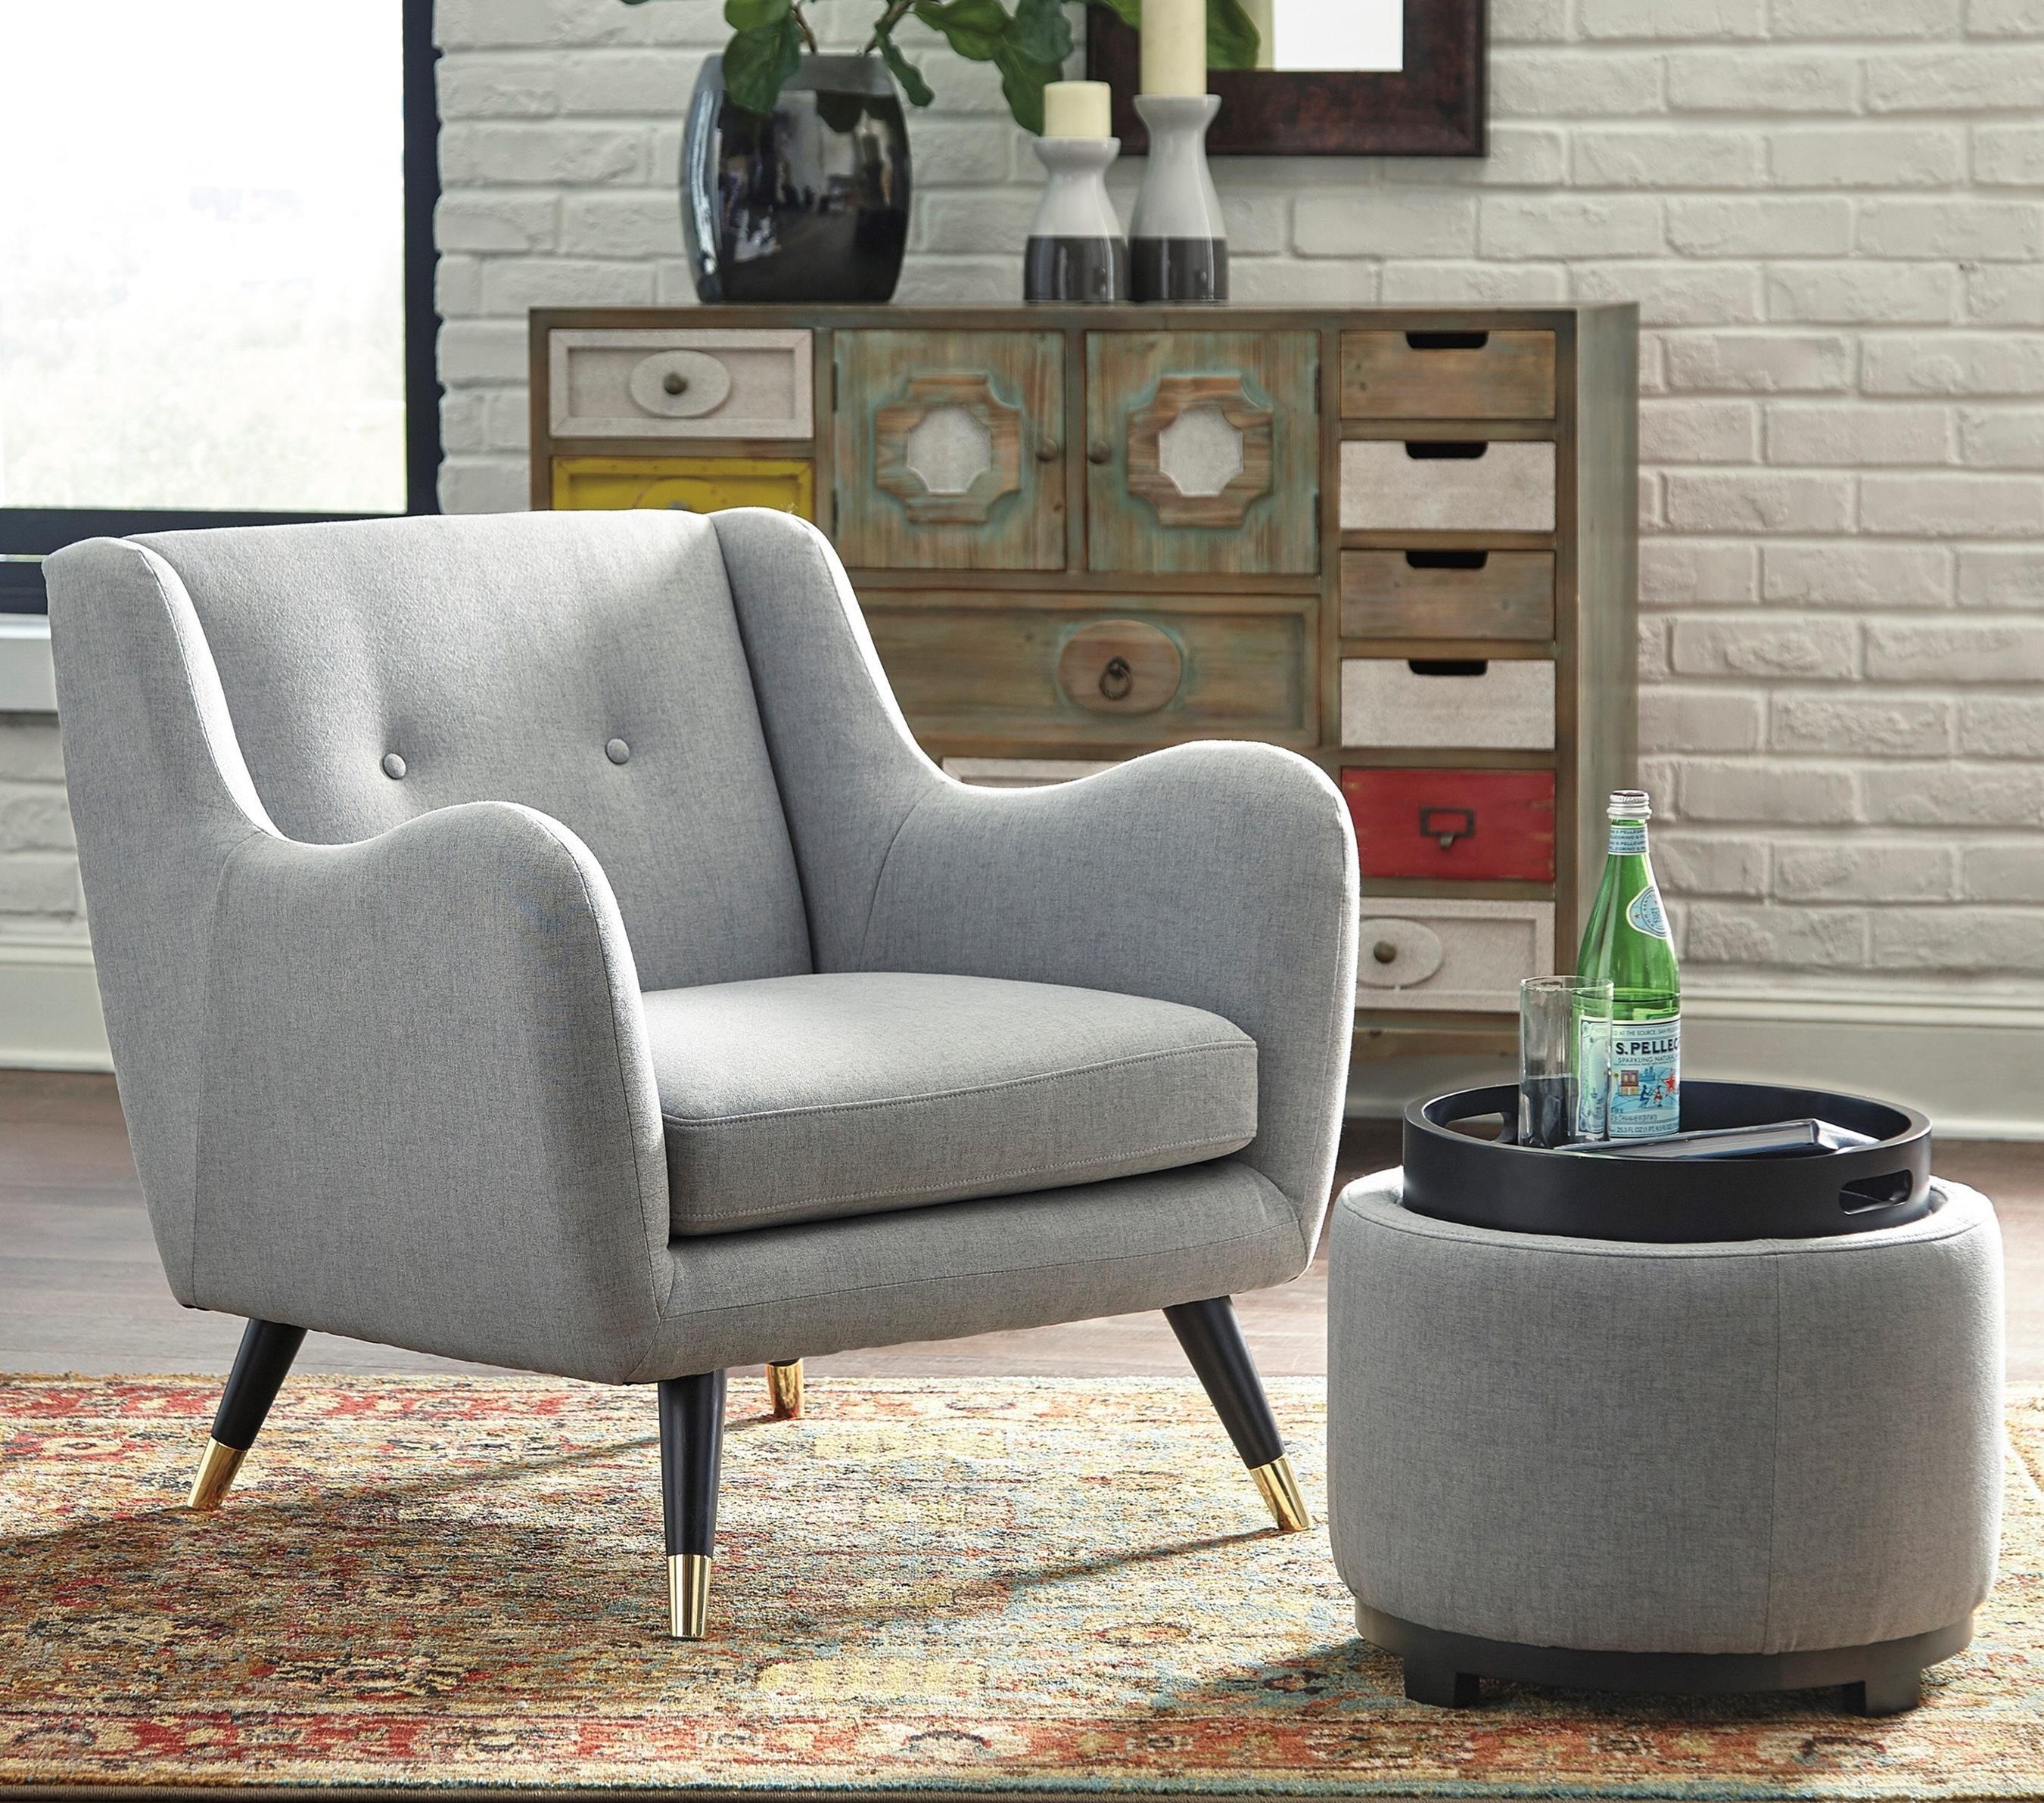 Mid Century Modern Accent Chair Ottoman With Storage